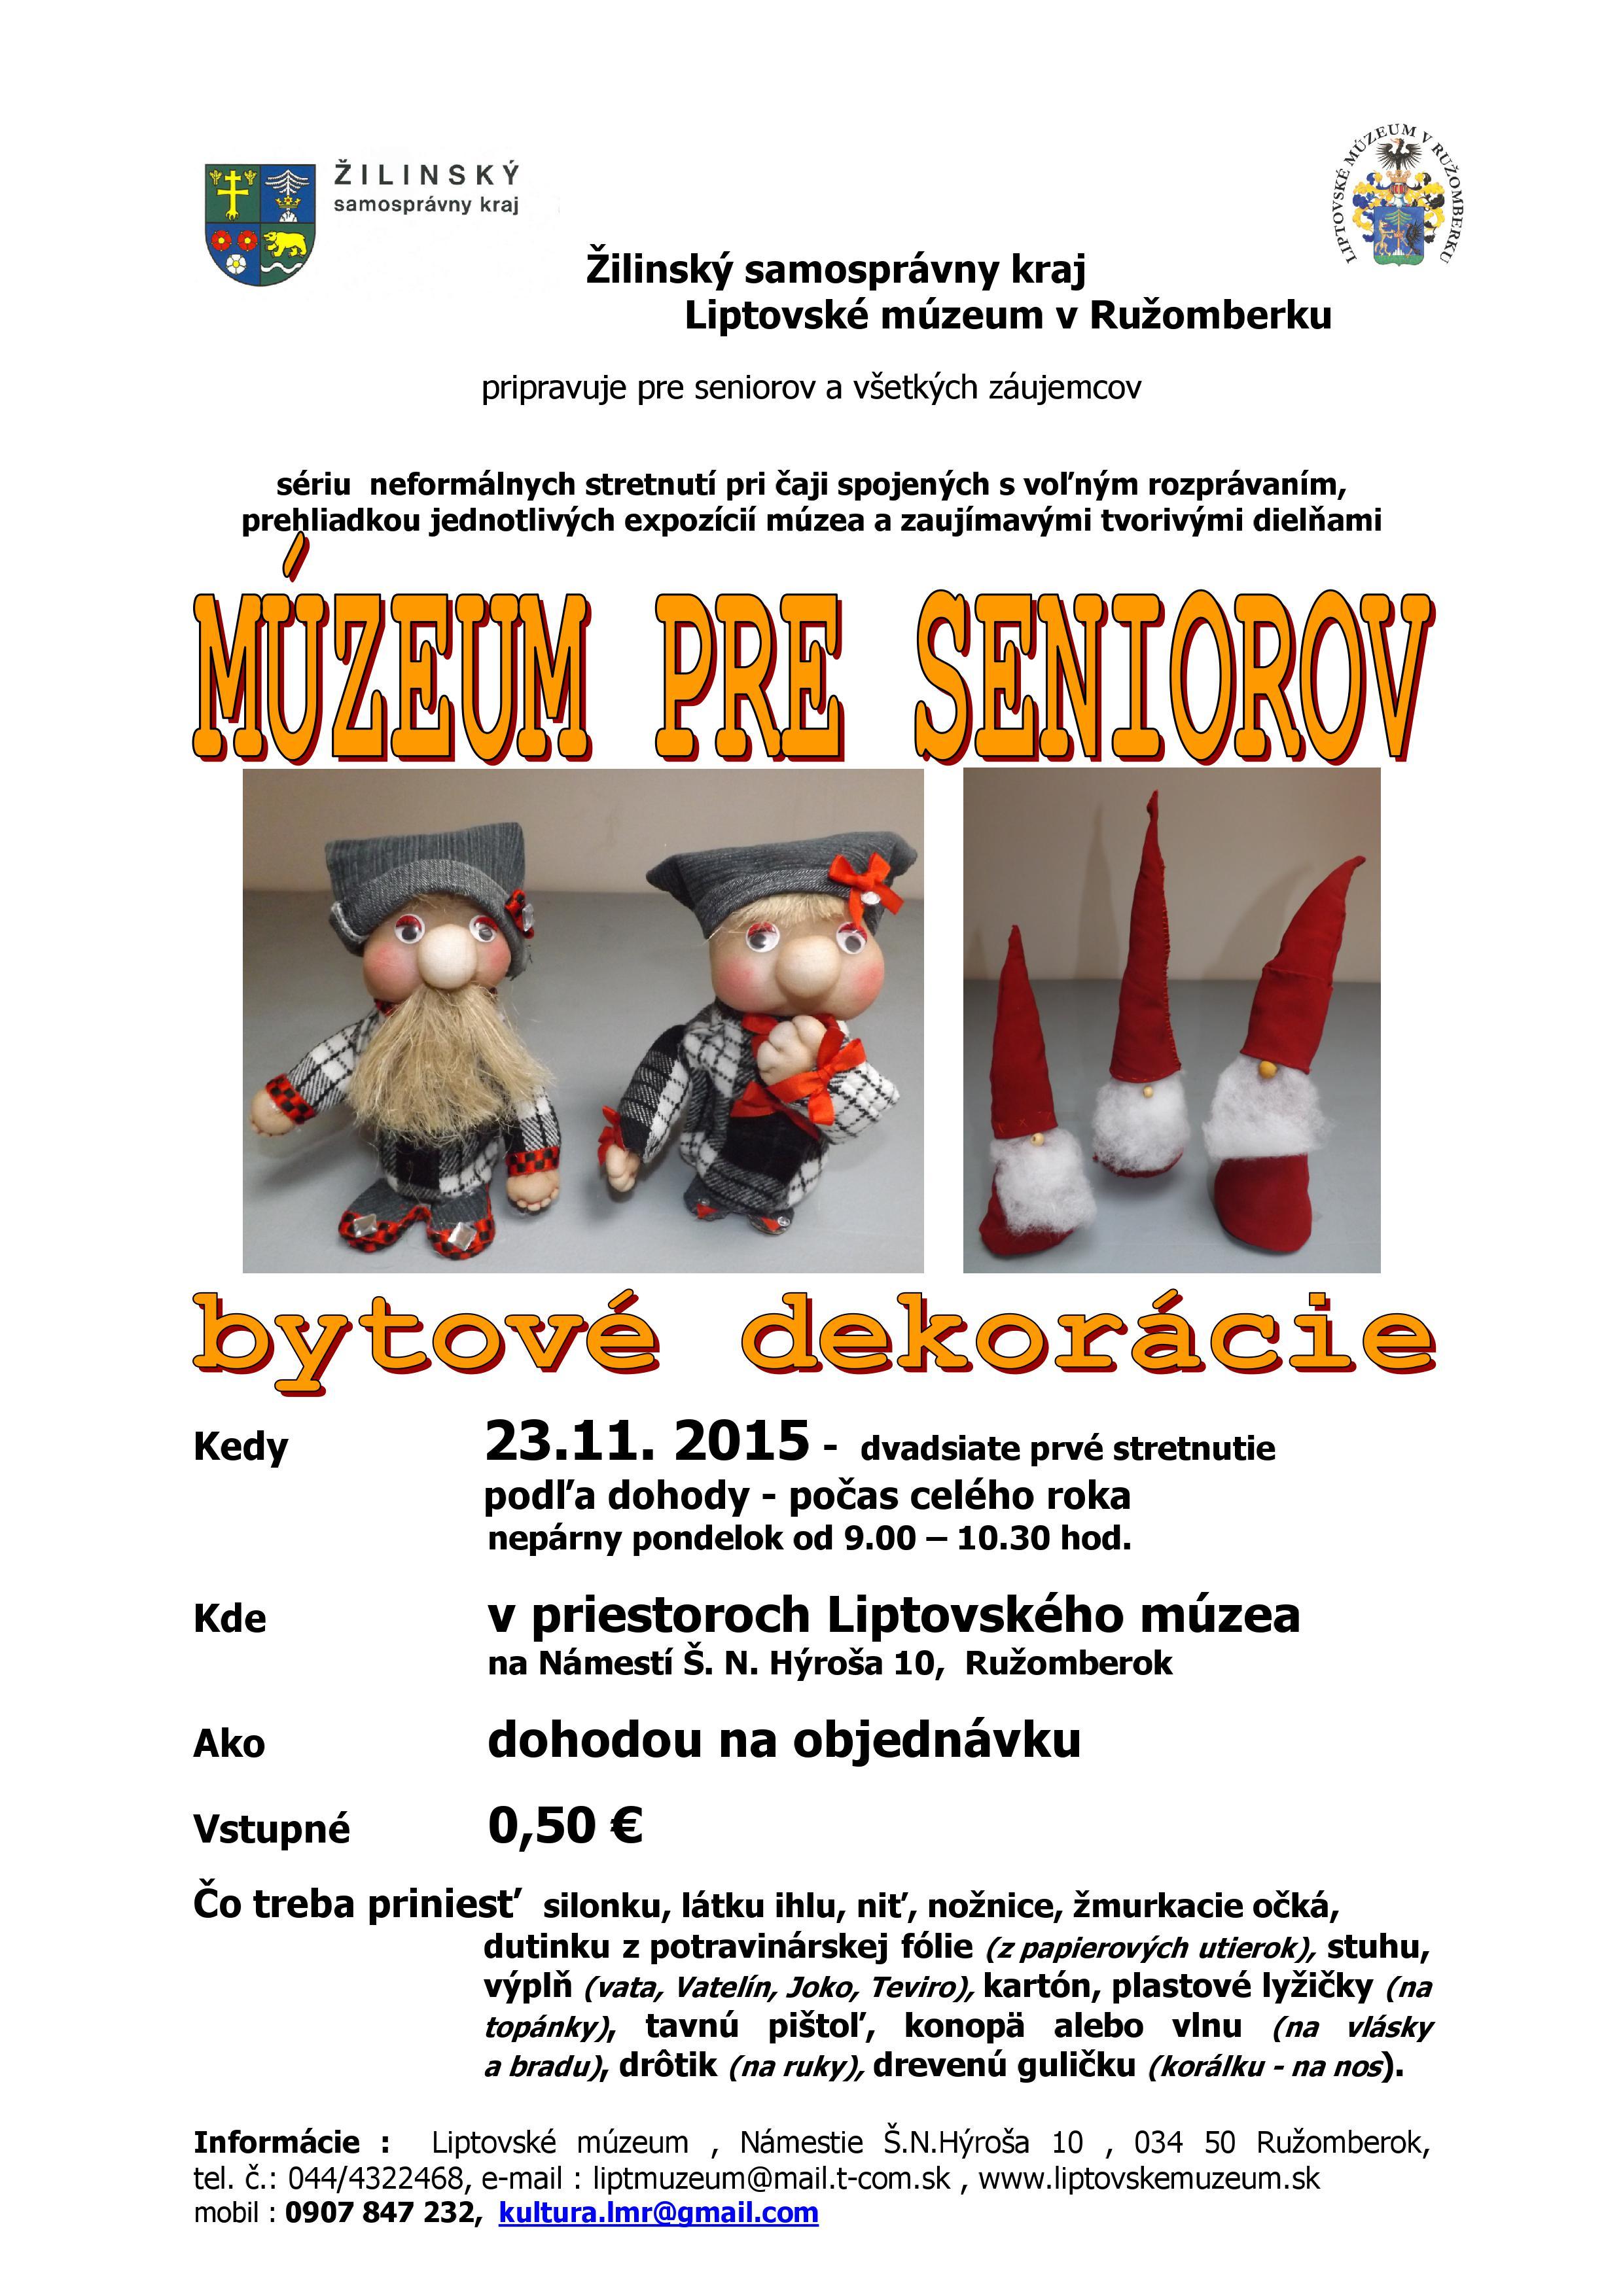 mps-bytove-dekoracie-23-11-15-plagat